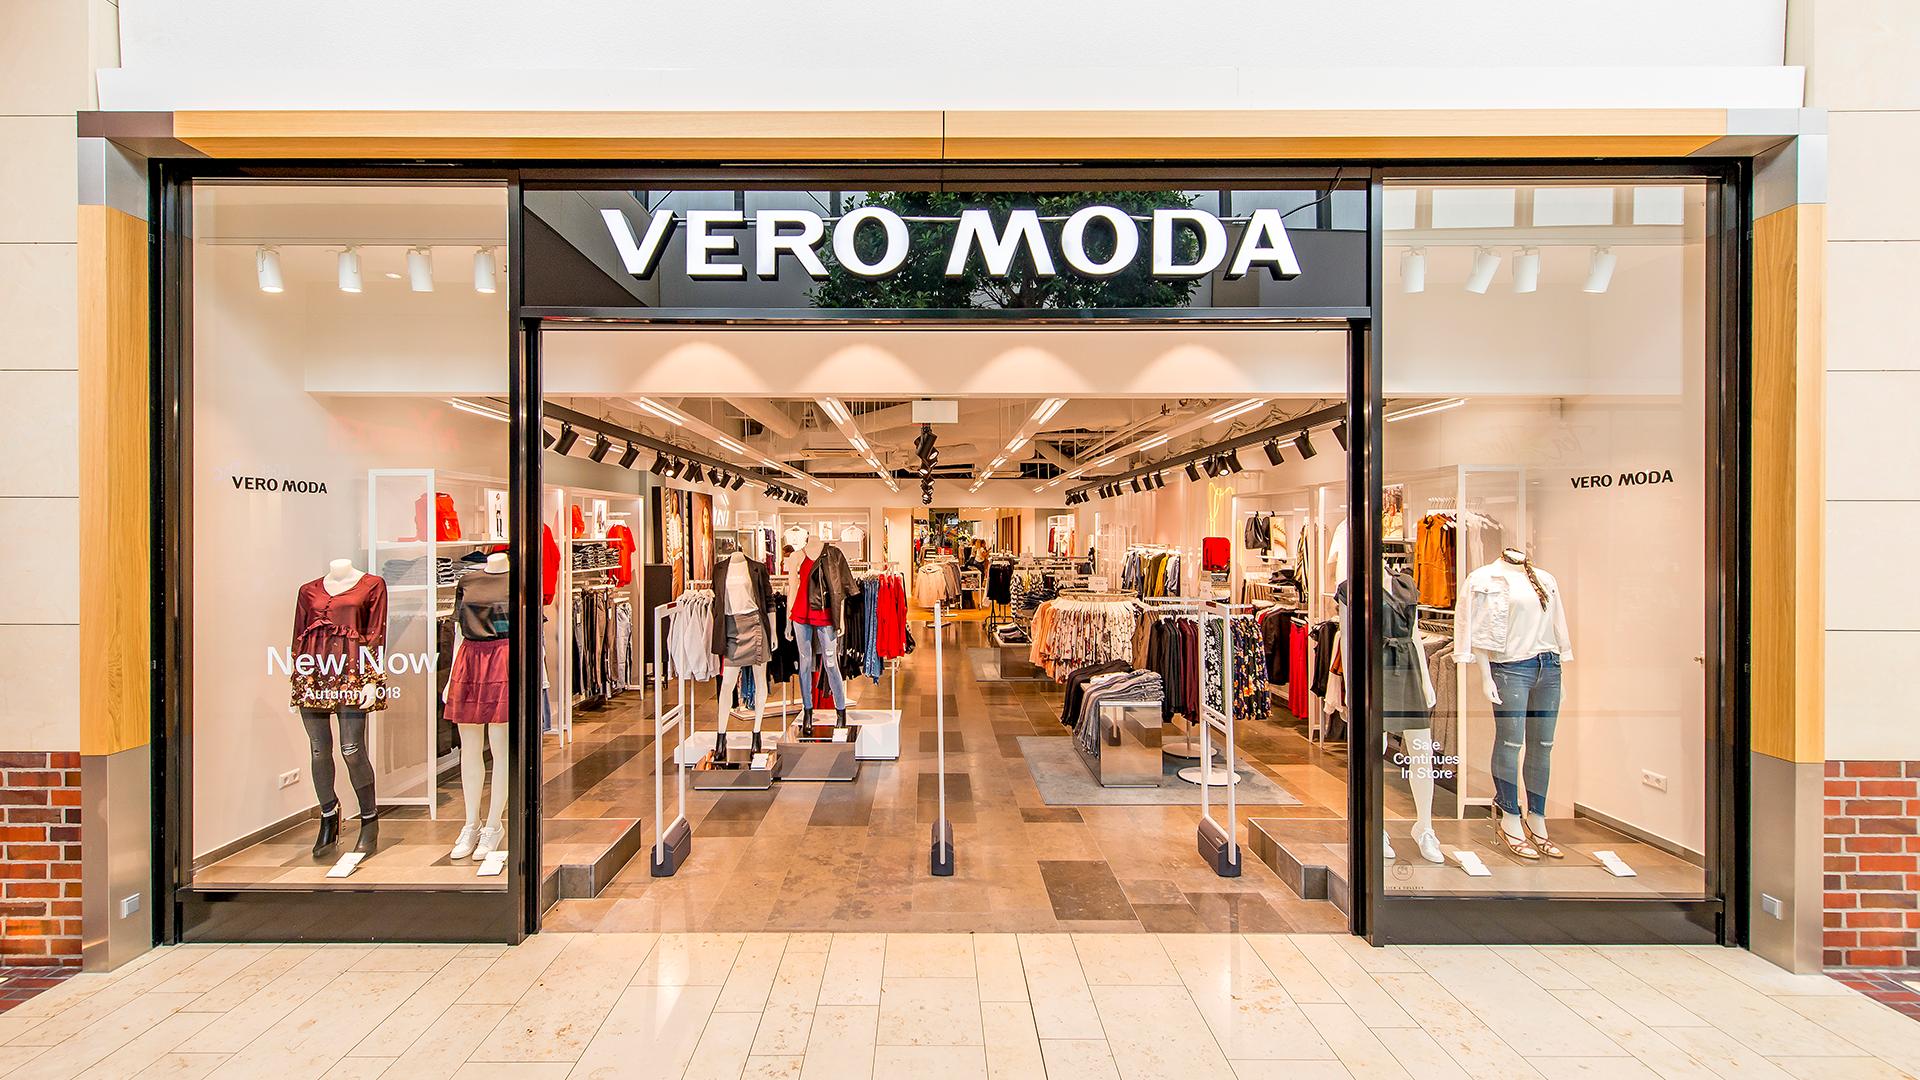 buy online 0ee95 b56e8 Vero Moda - LOOKENTOR - Die Shopping-Galerie im Herzen von ...